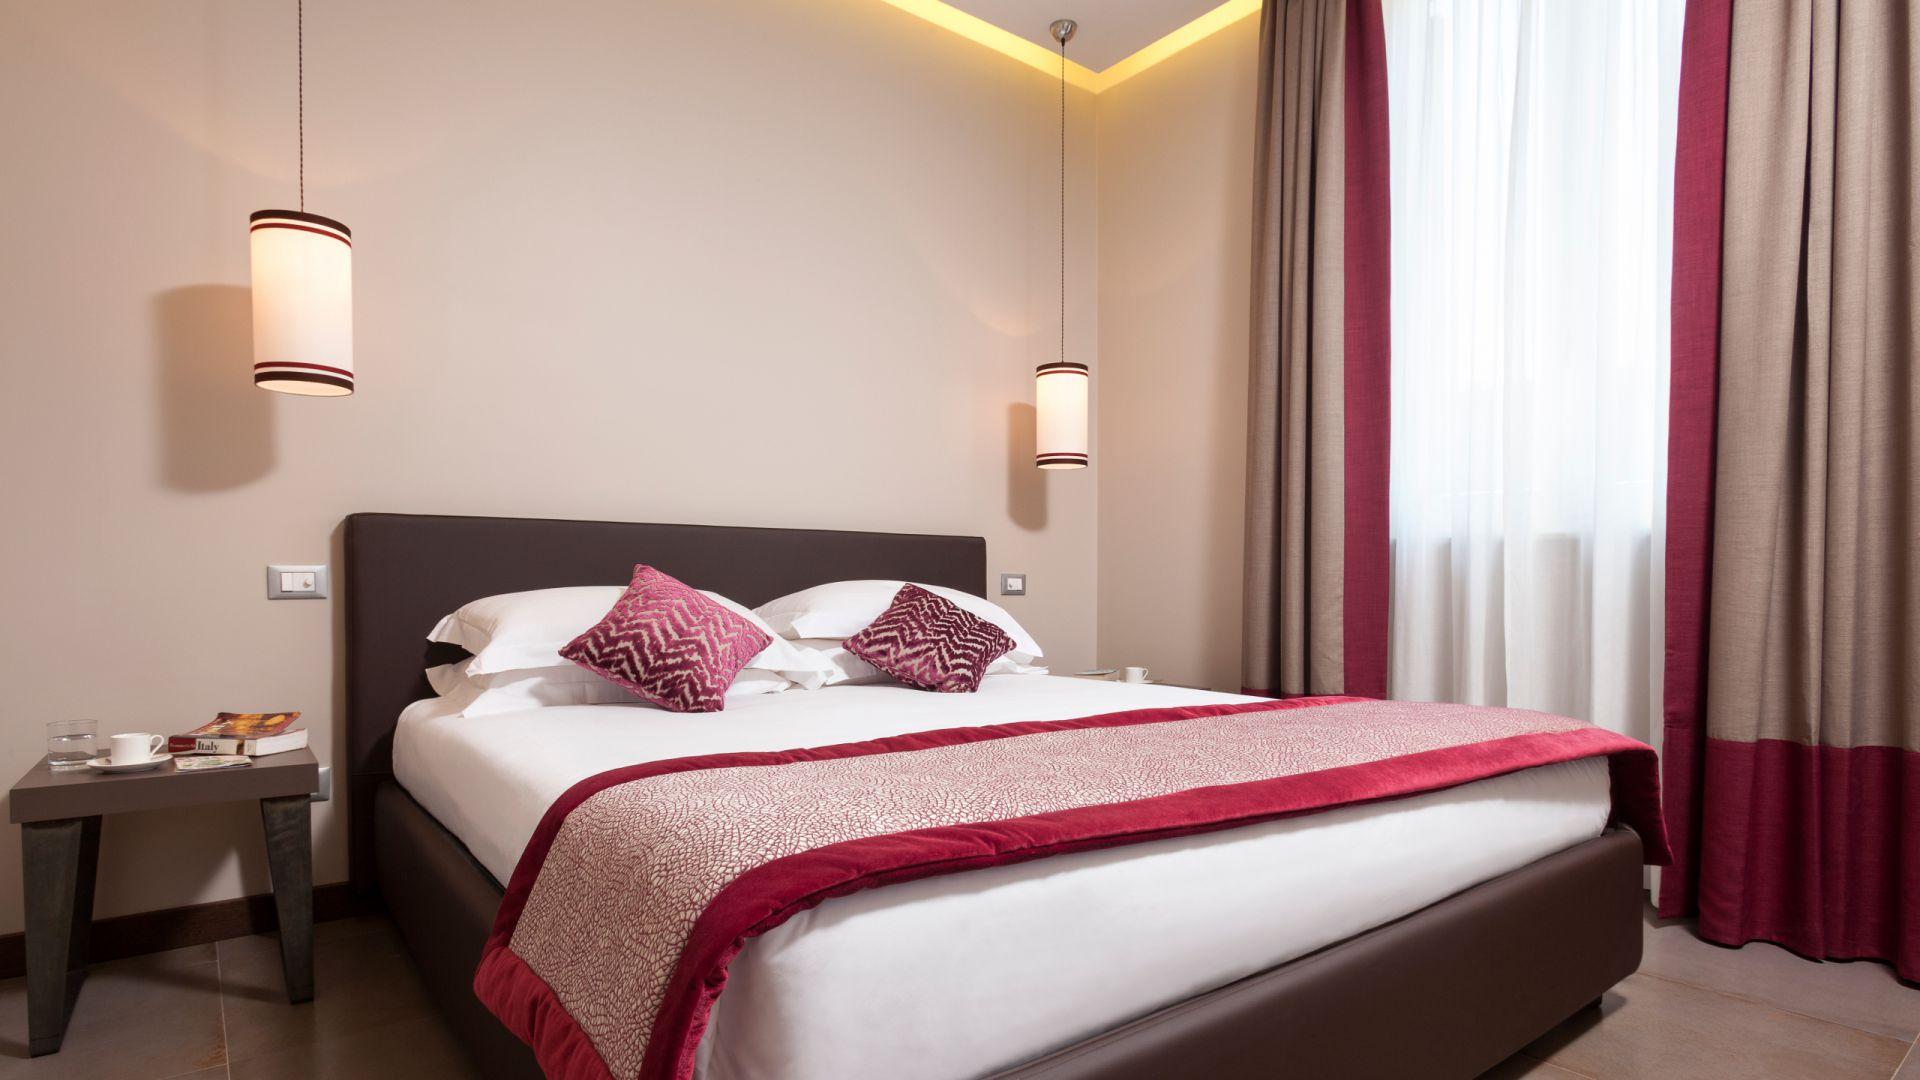 residence-trianon-roma-appartamenti-A24_005_(7053)_AltaRis.jpg